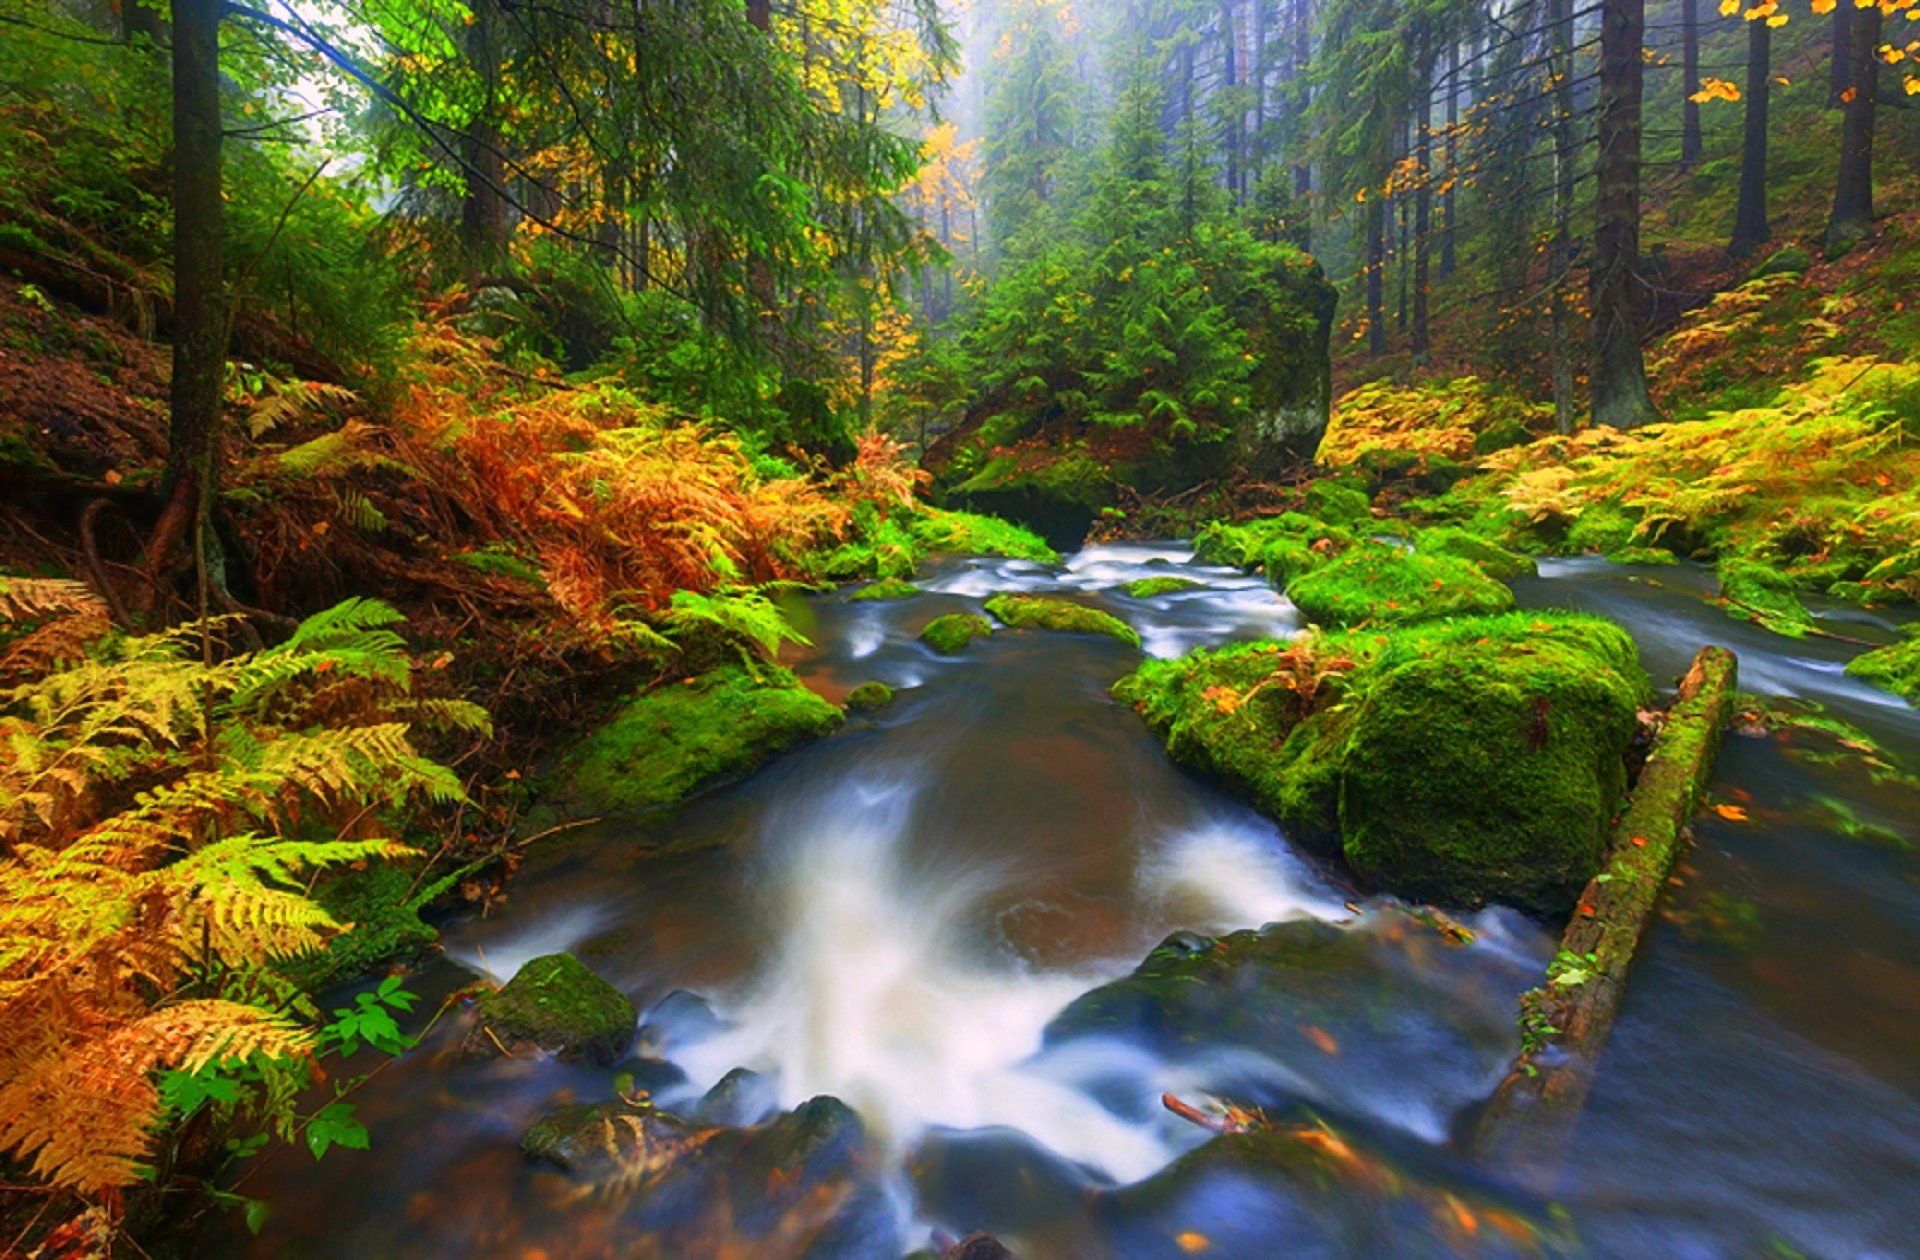 the fall stream